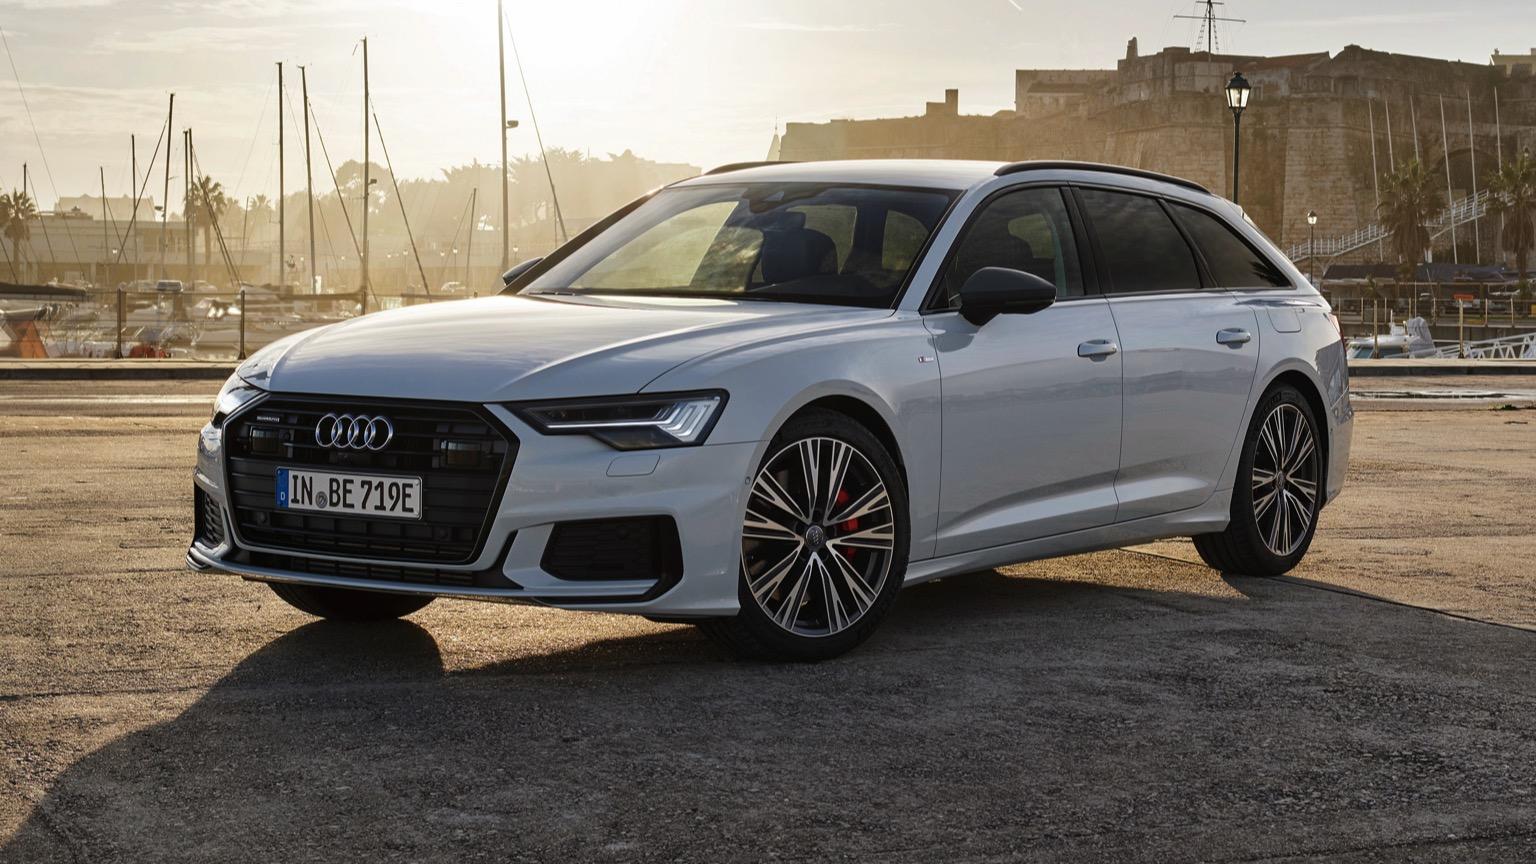 Audi A6 Avant 55 TFSI e quattro (2020)